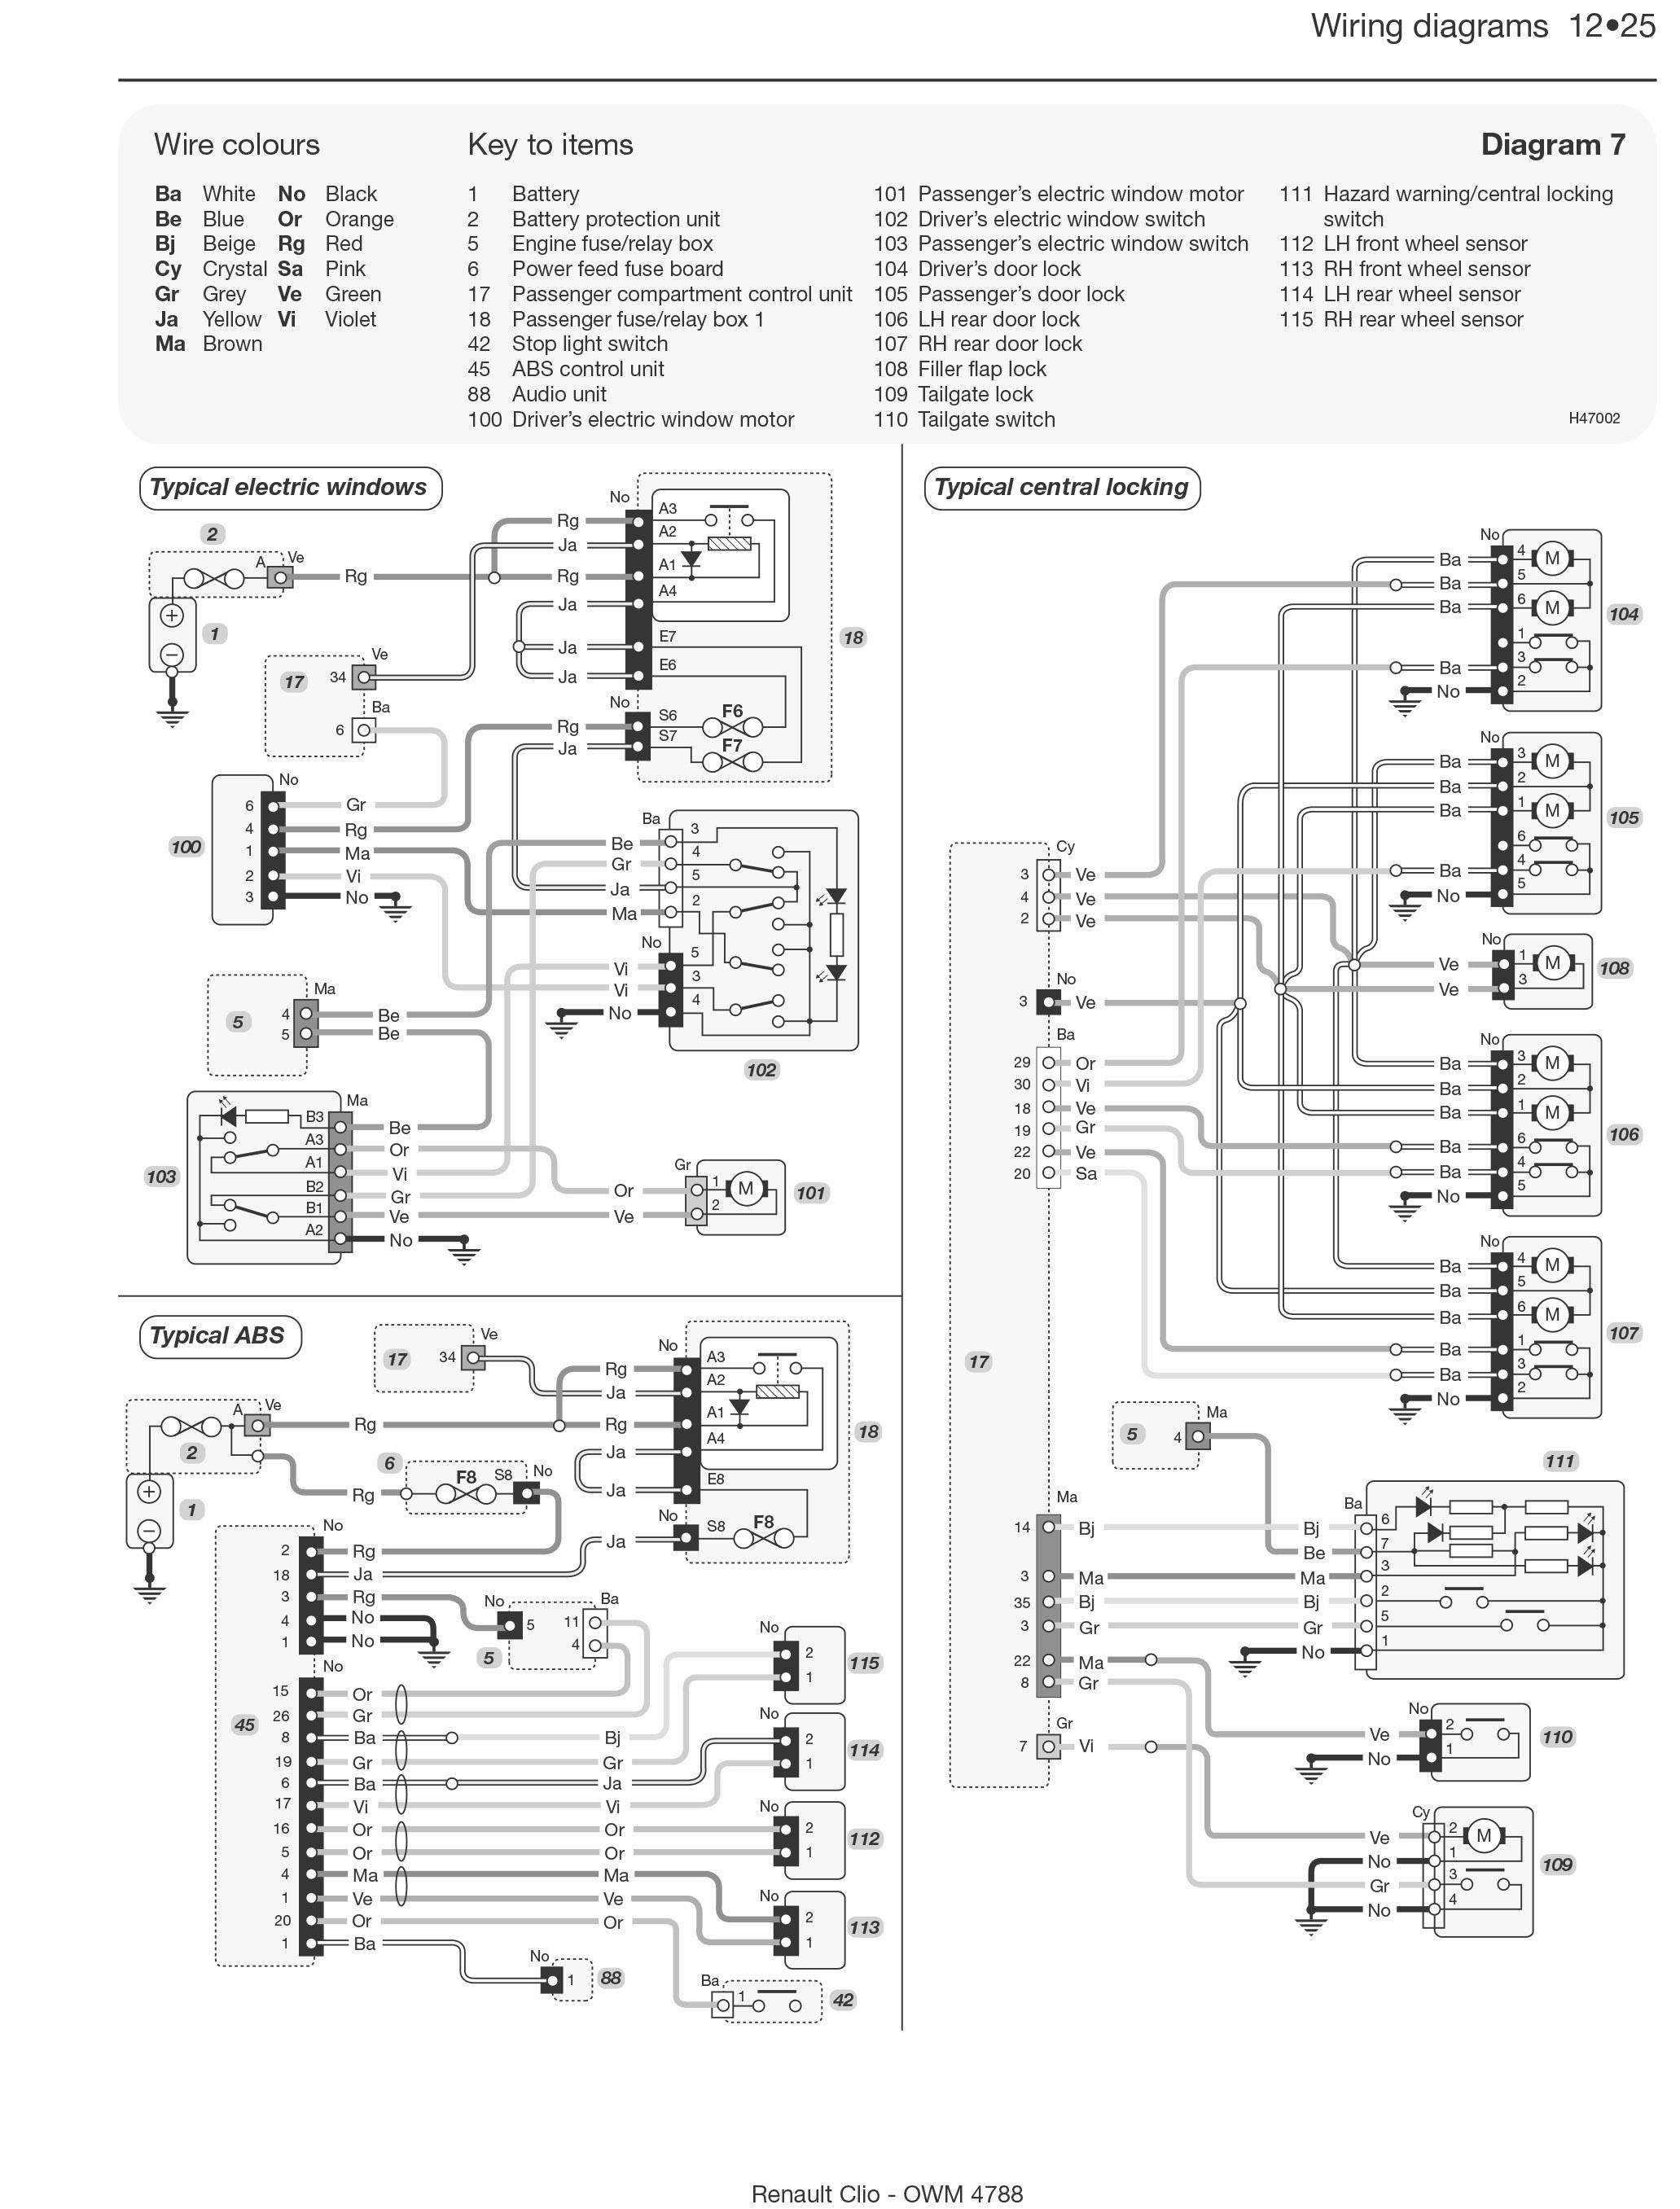 renault clio wiring diagram download renault clio wiring diagram